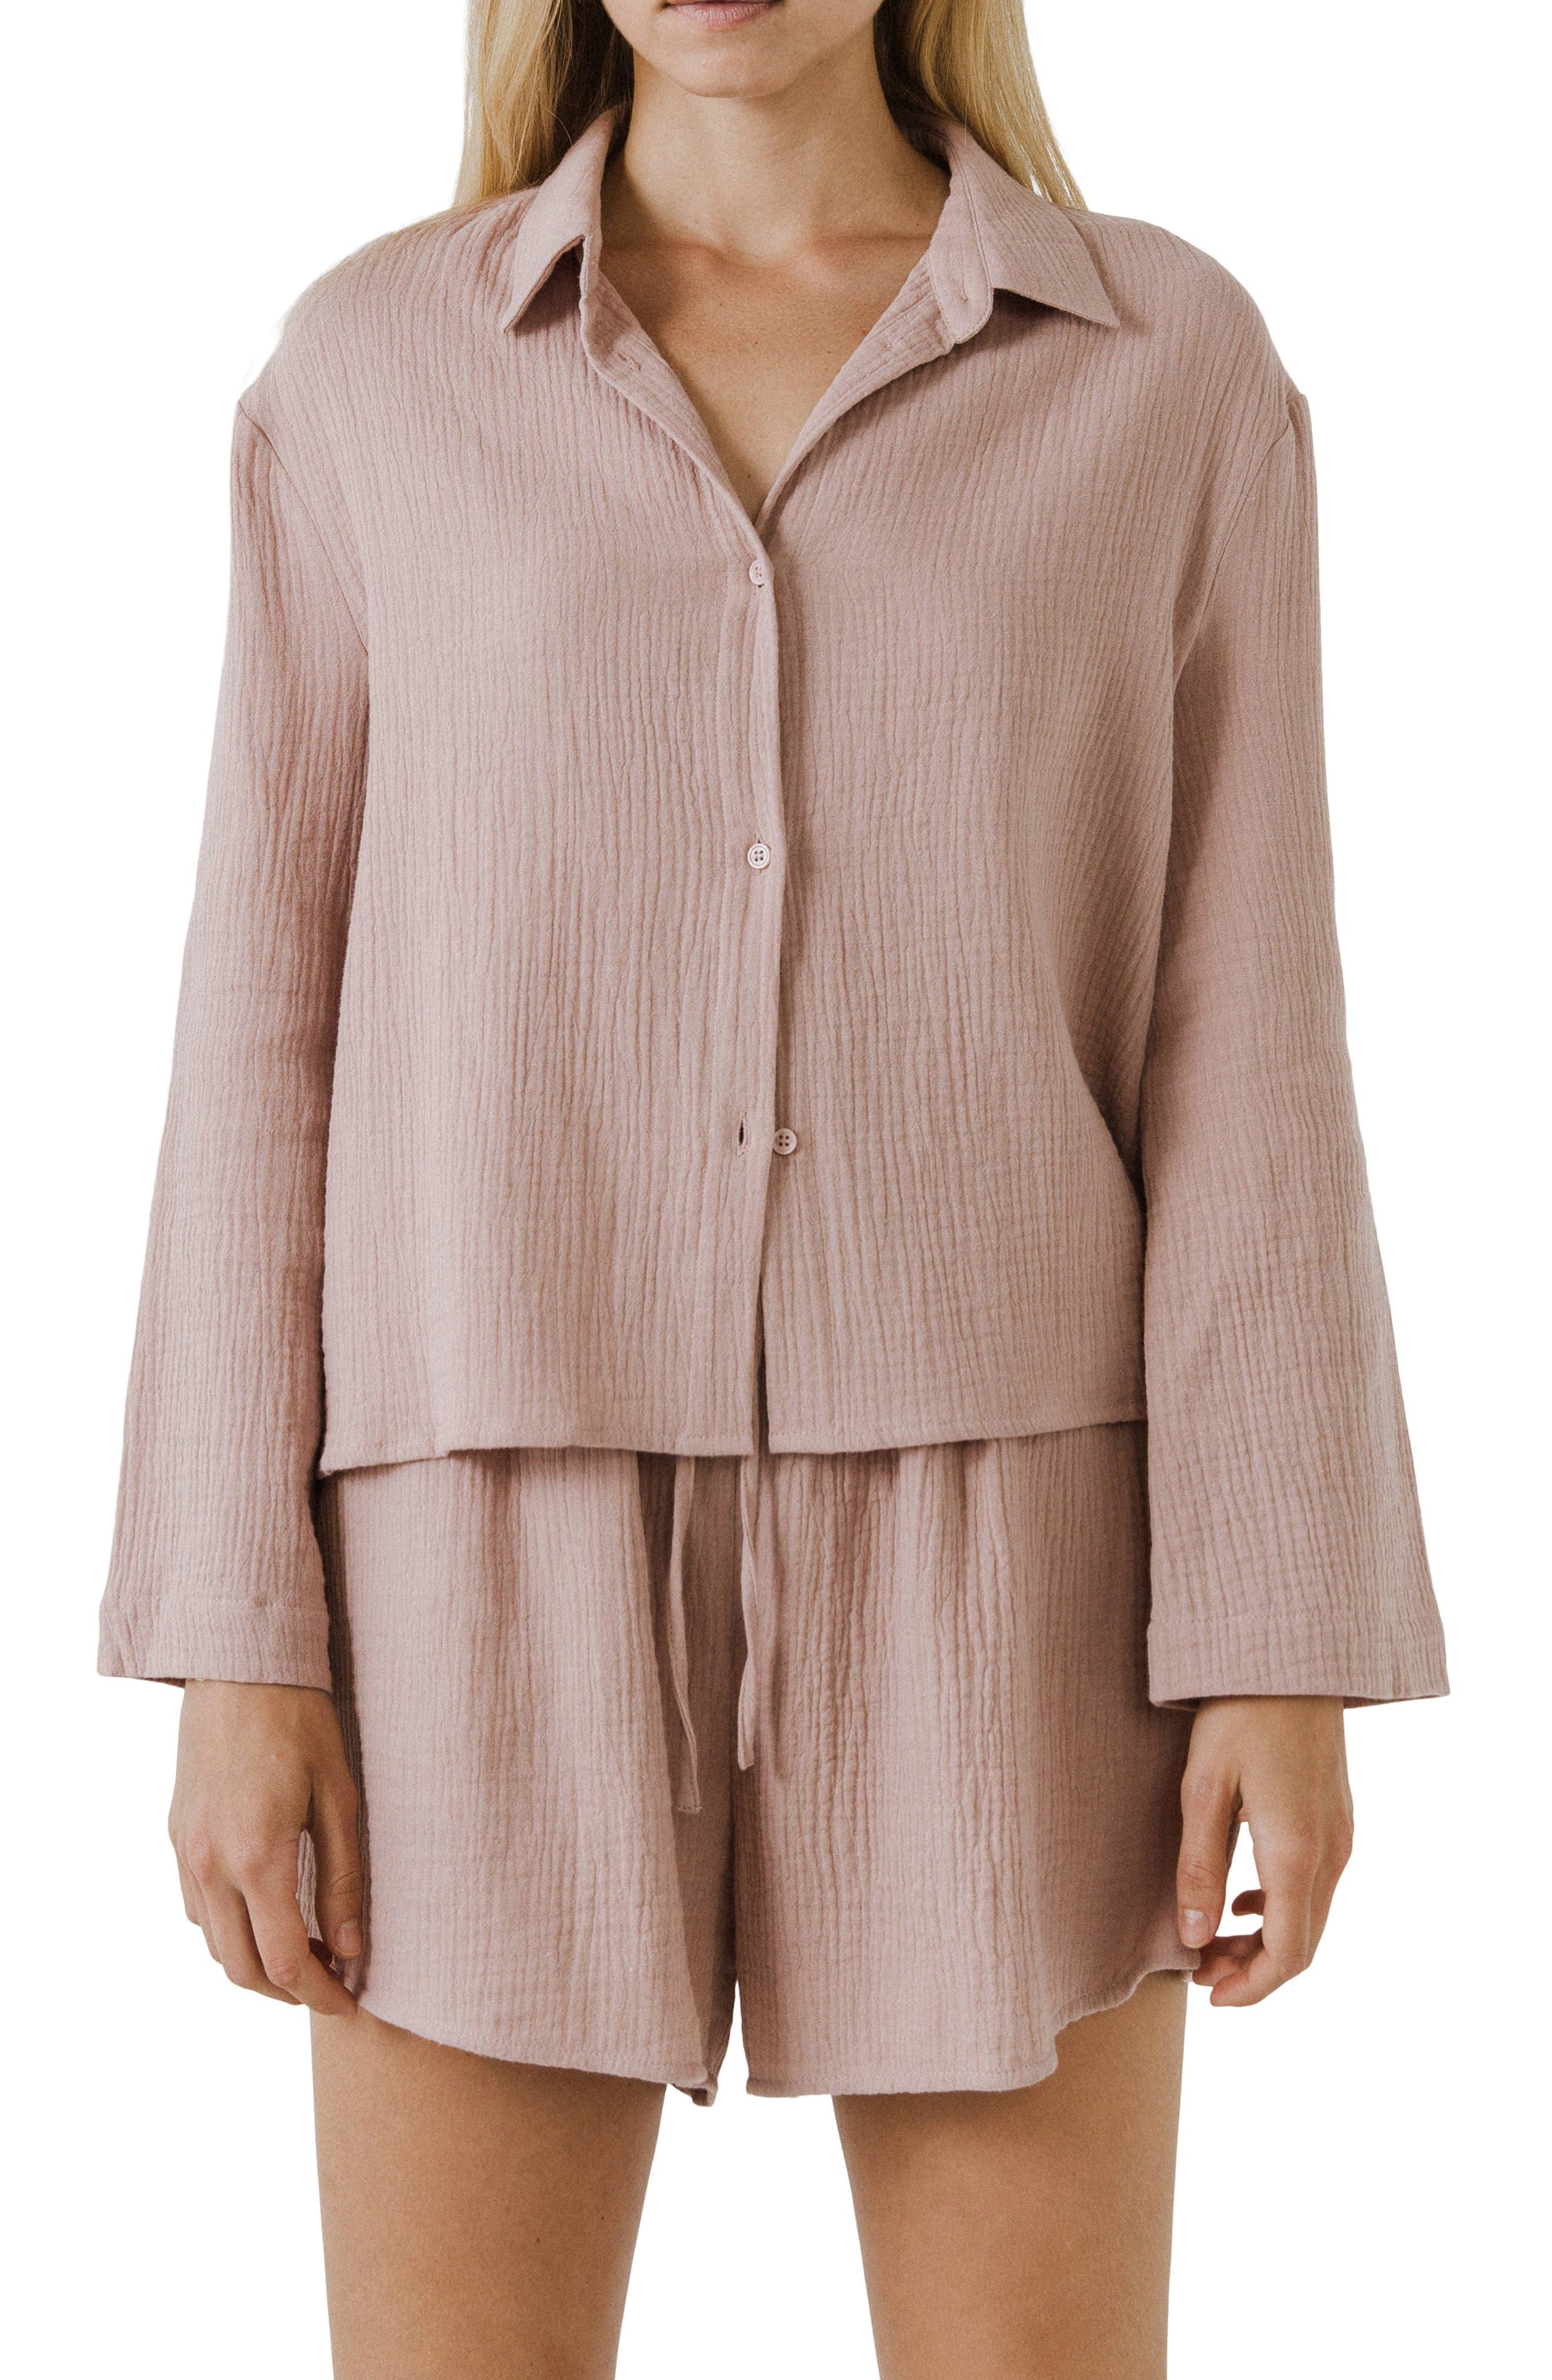 Cotton Gauze Button-Up Shirt